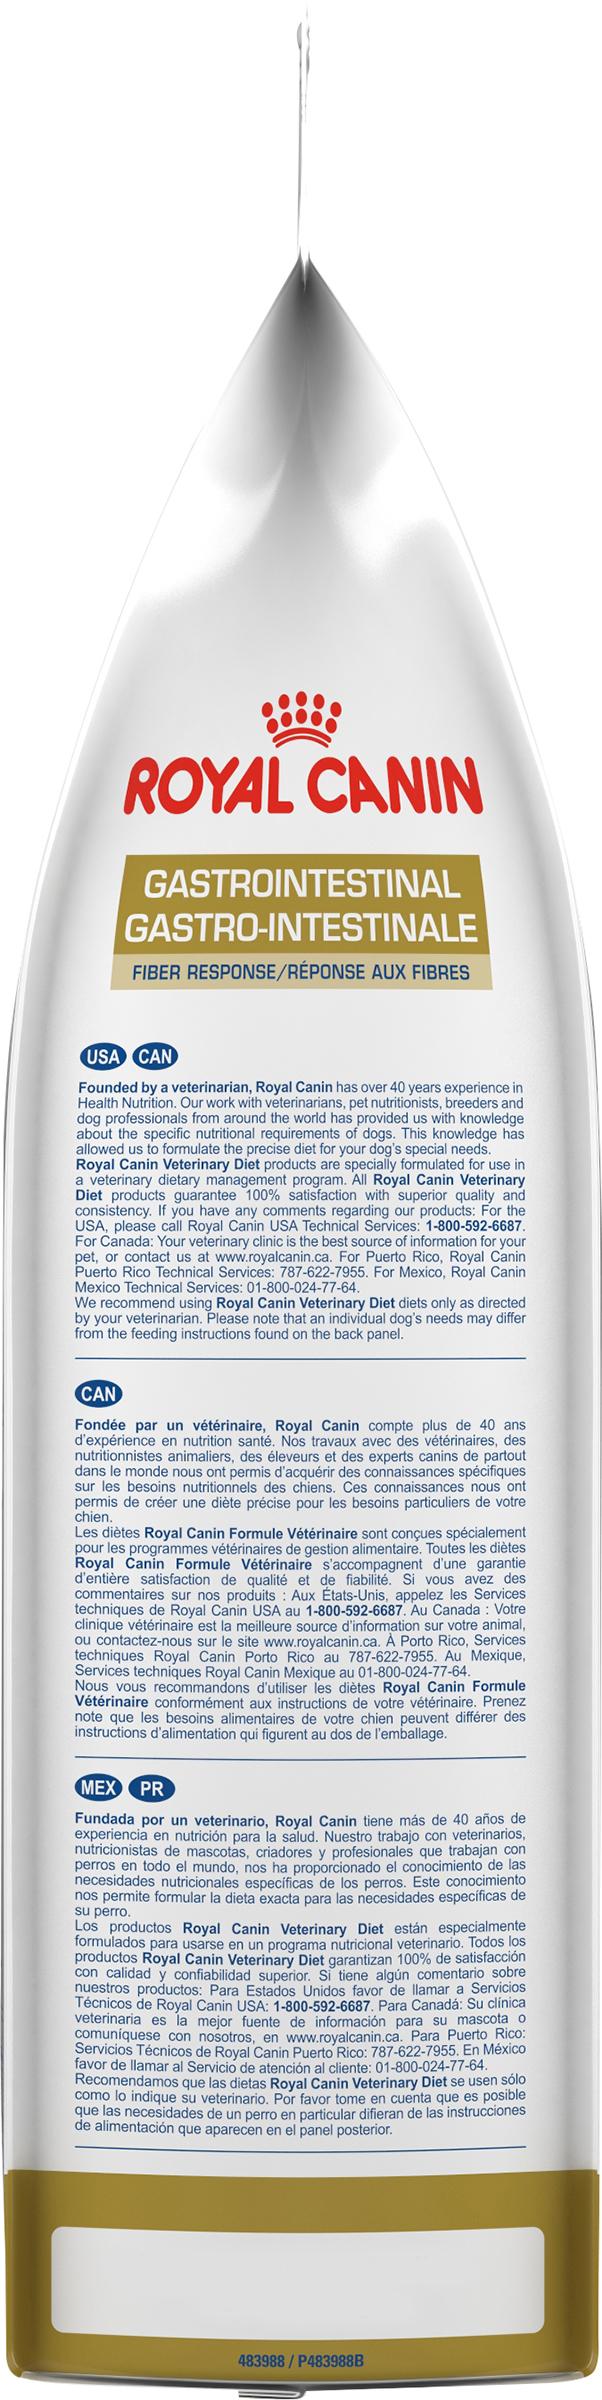 Canine Gastrointestinal Fiber Response Dry Dog Food